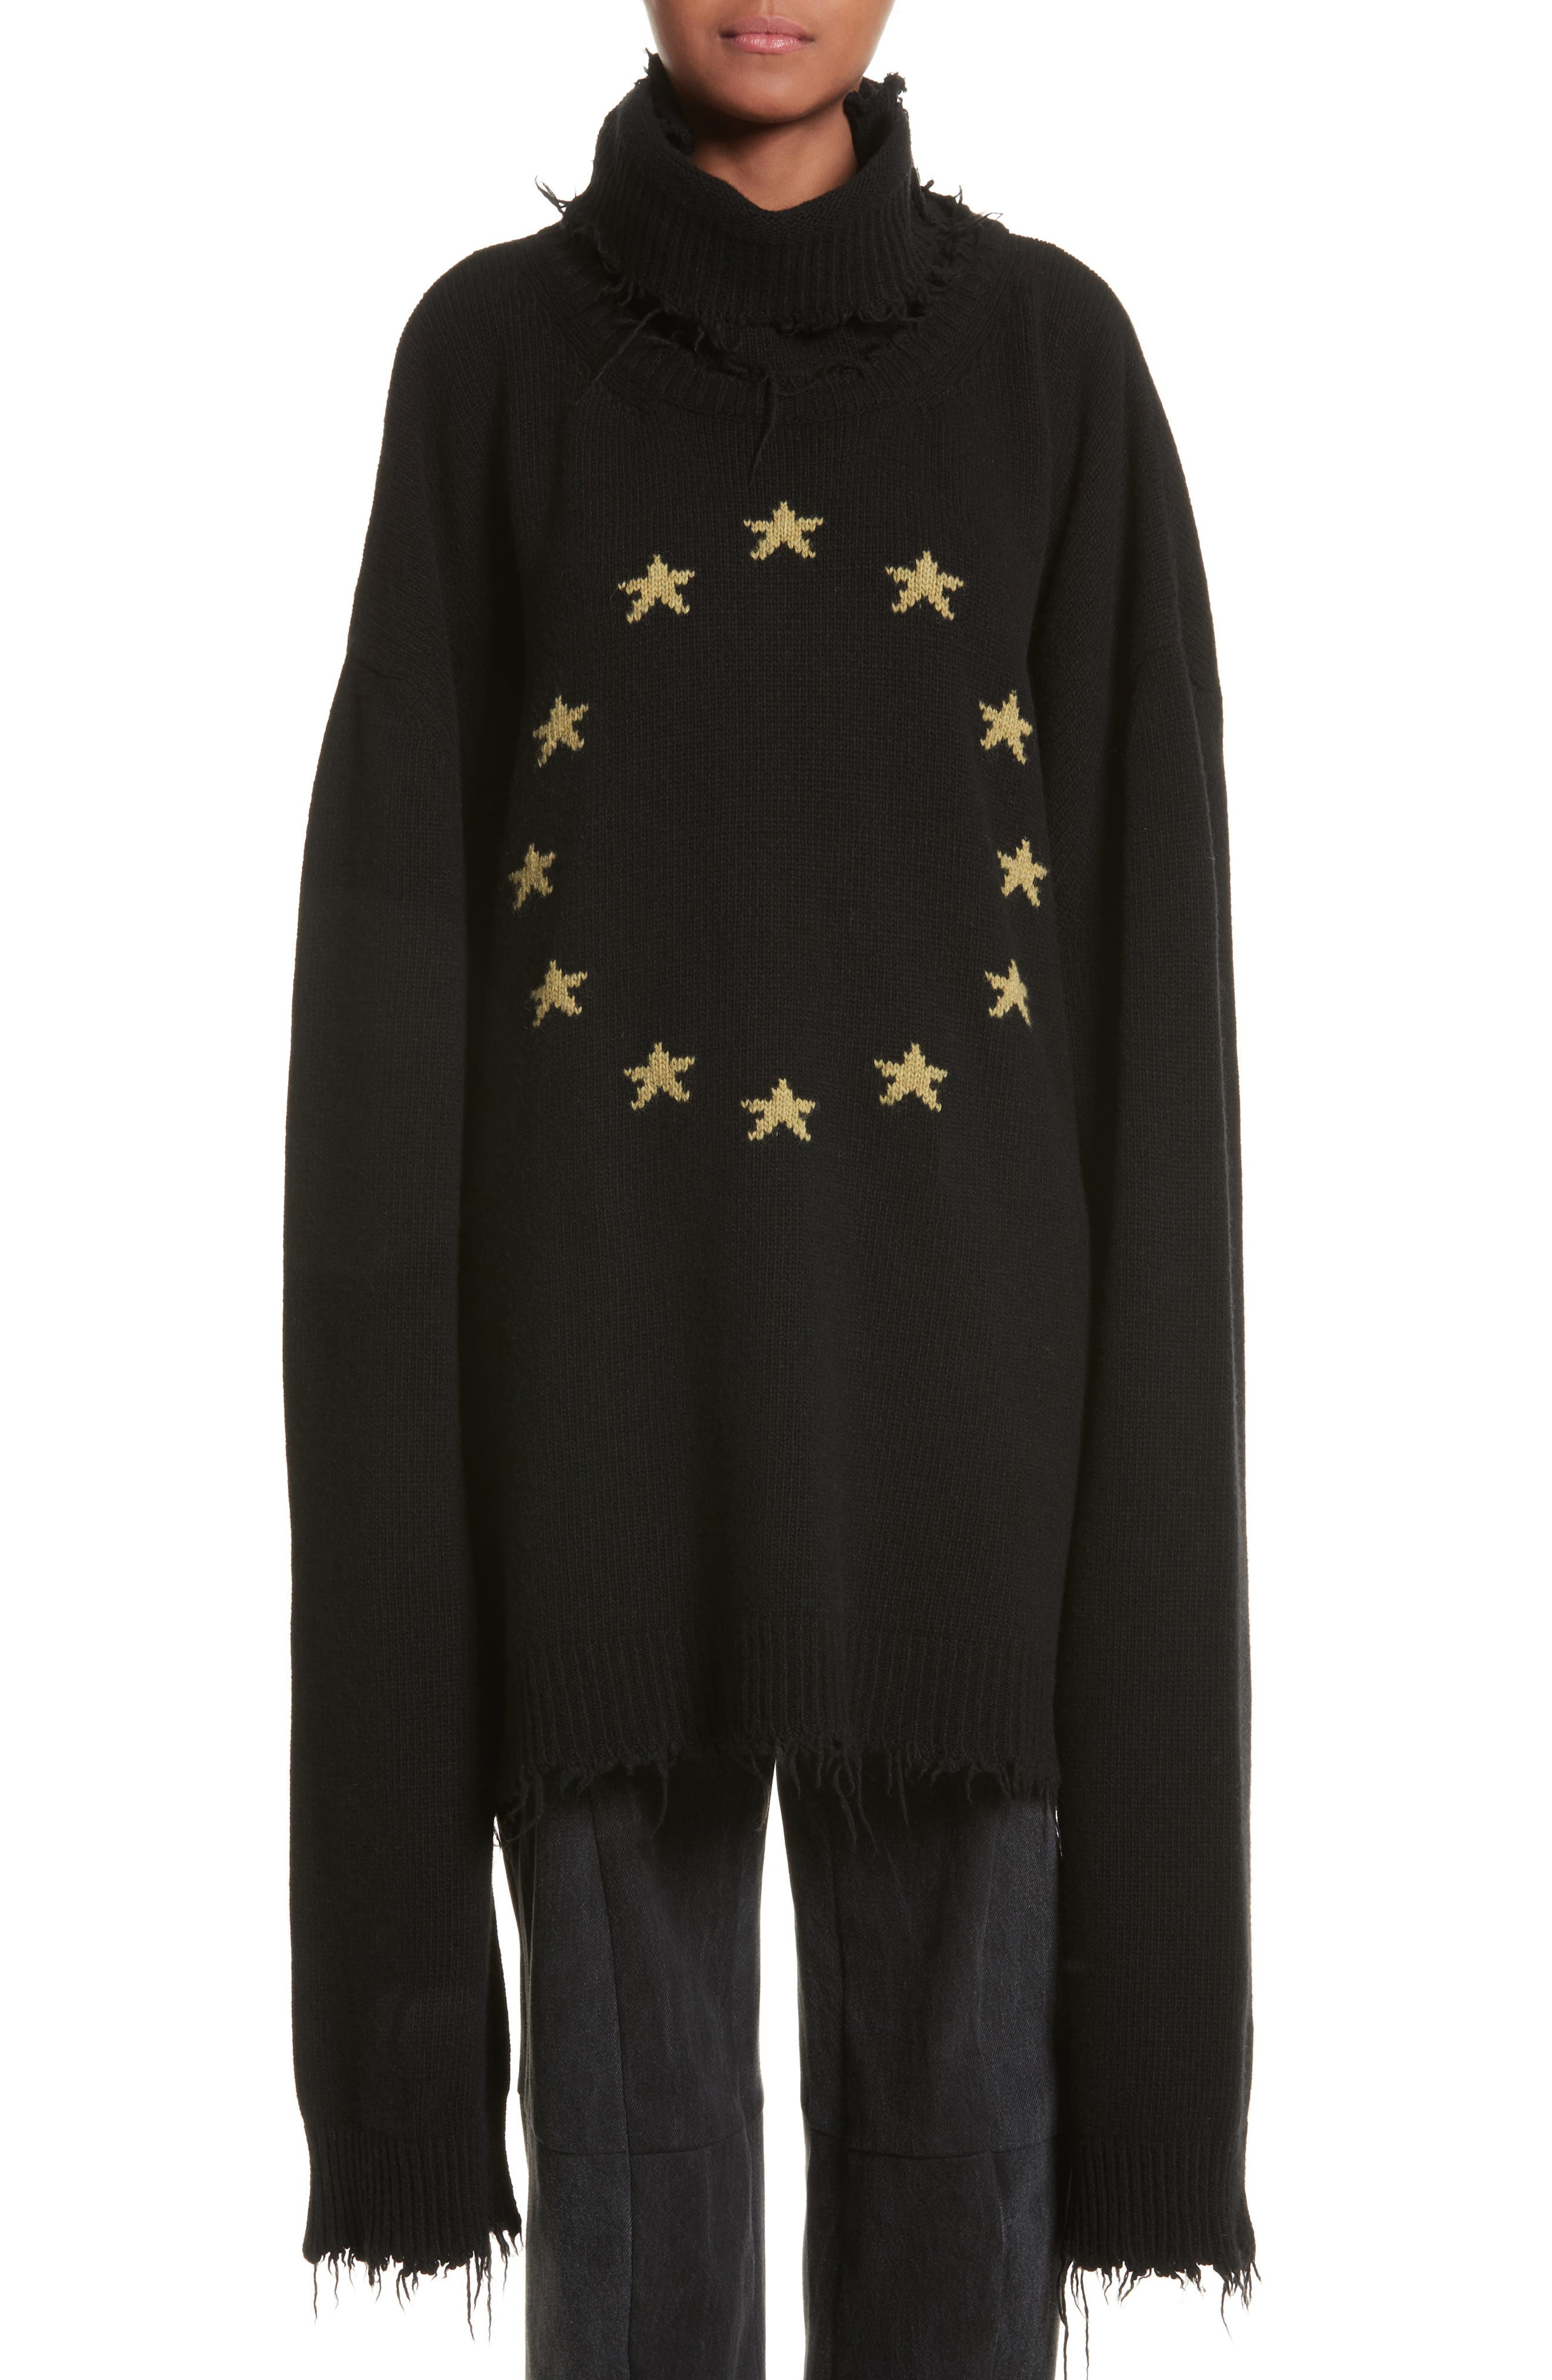 Star Turtleneck Sweater,                         Main,                         color, 001